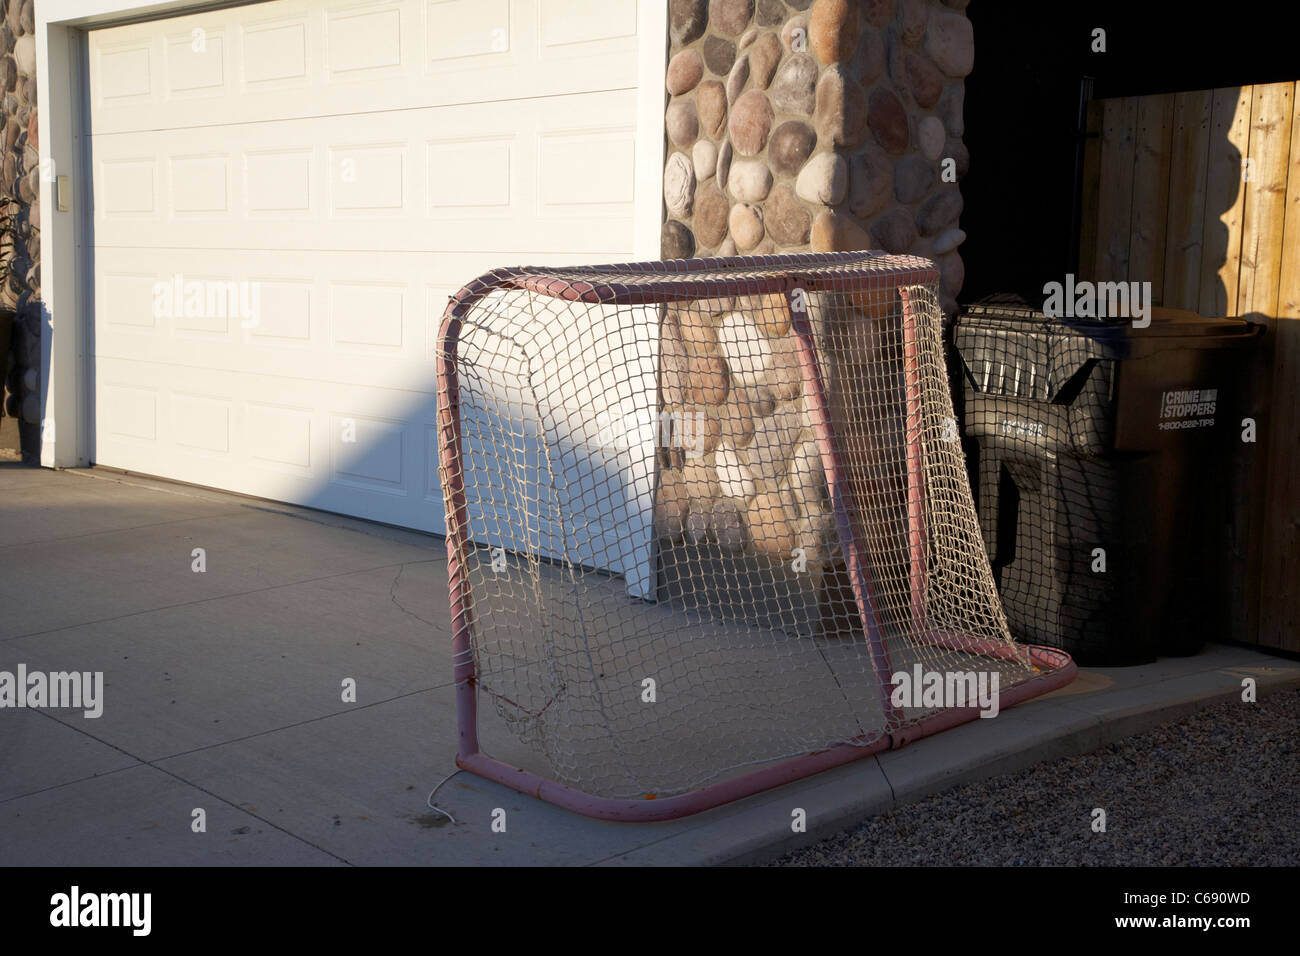 Hockey Net Stock Photos & Hockey Net Stock Images - Alamy